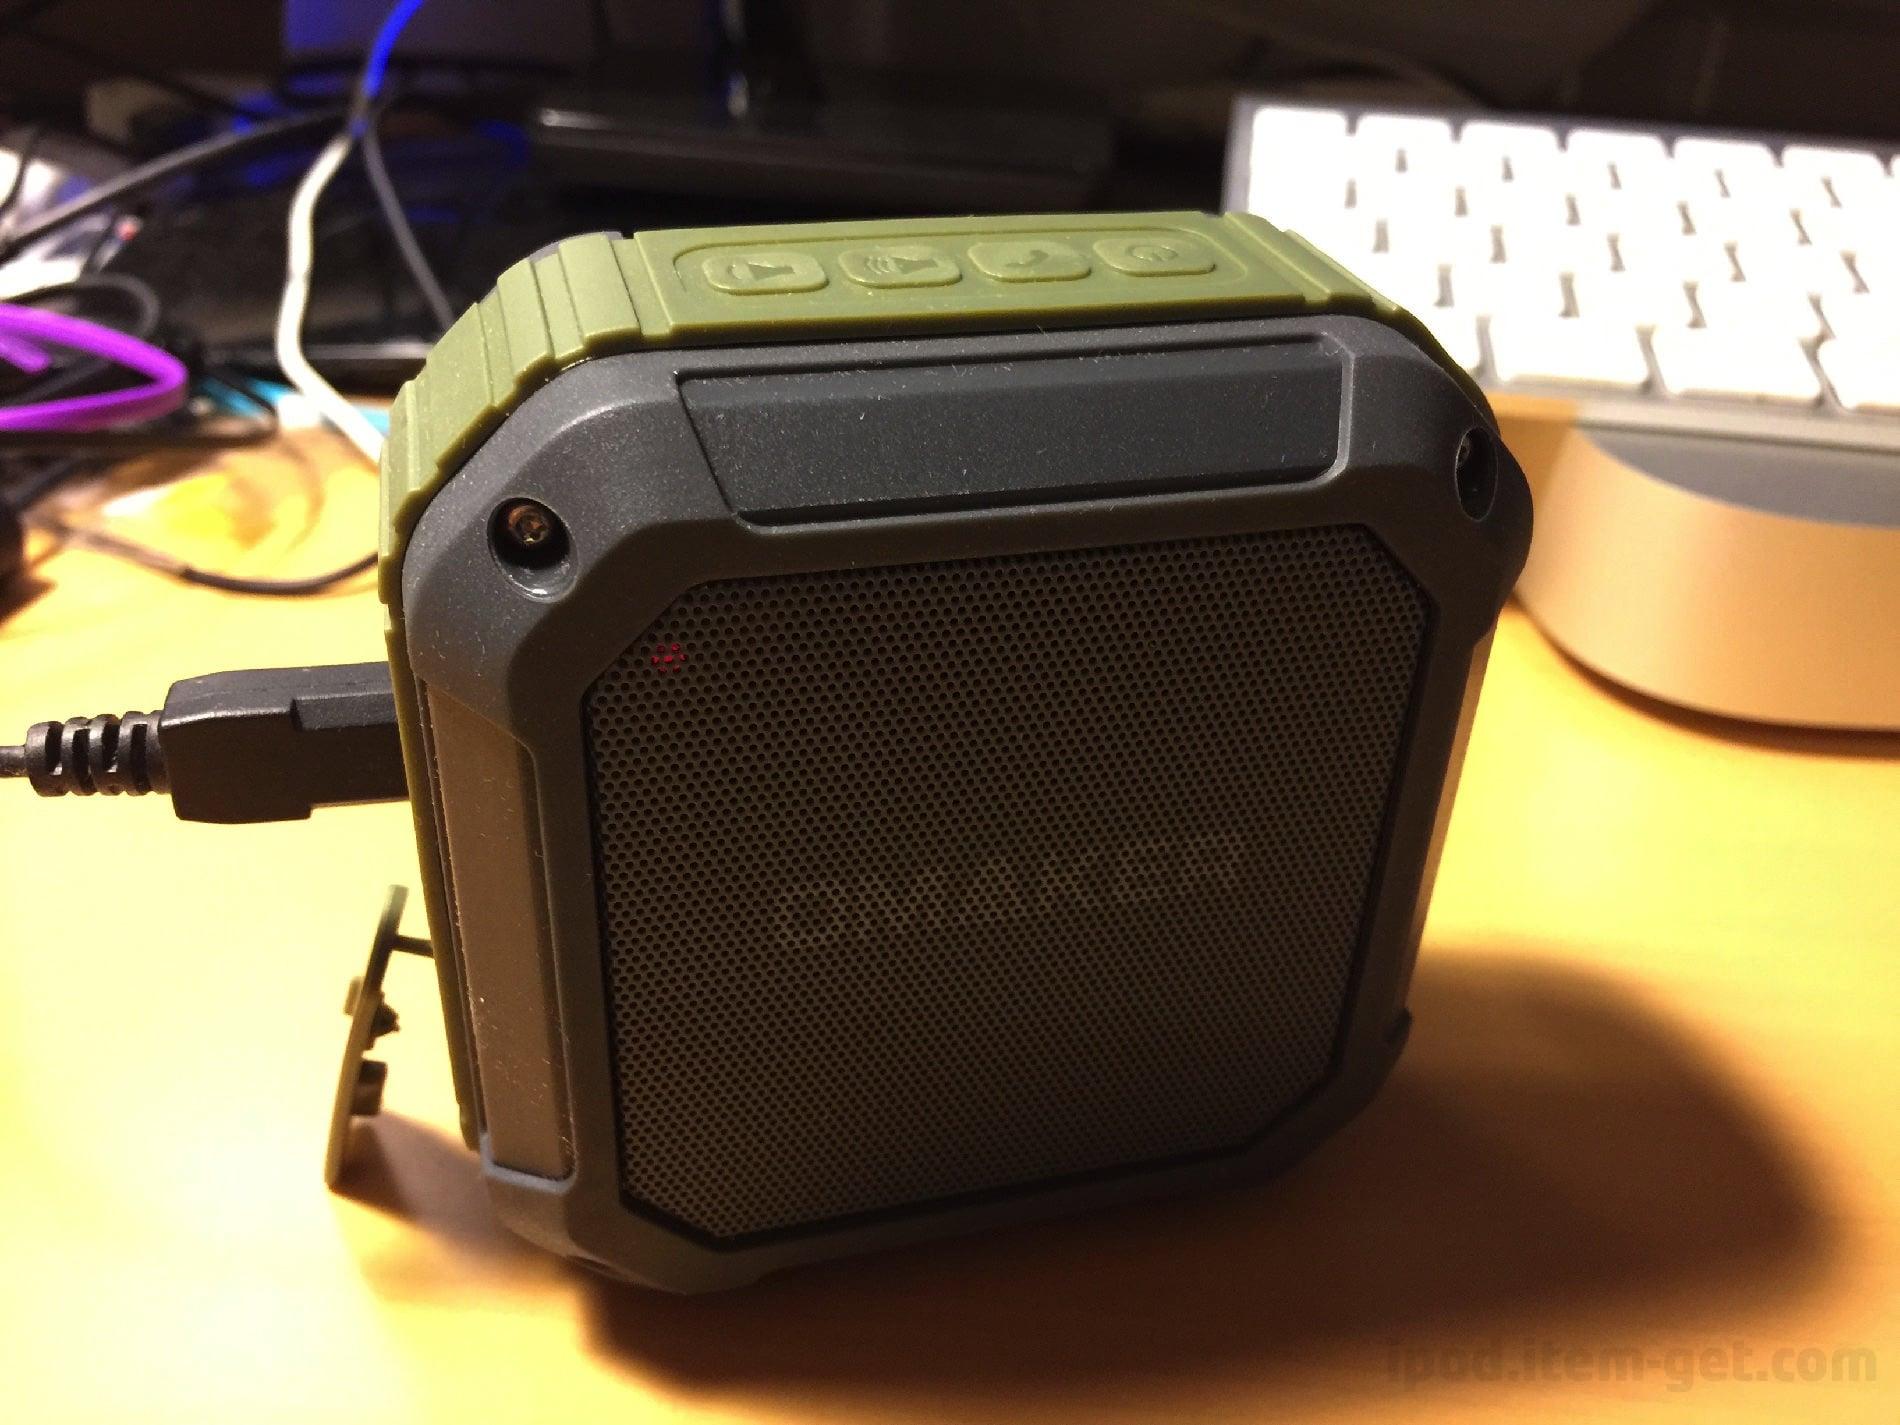 OmakerM4 BTSPKR 04